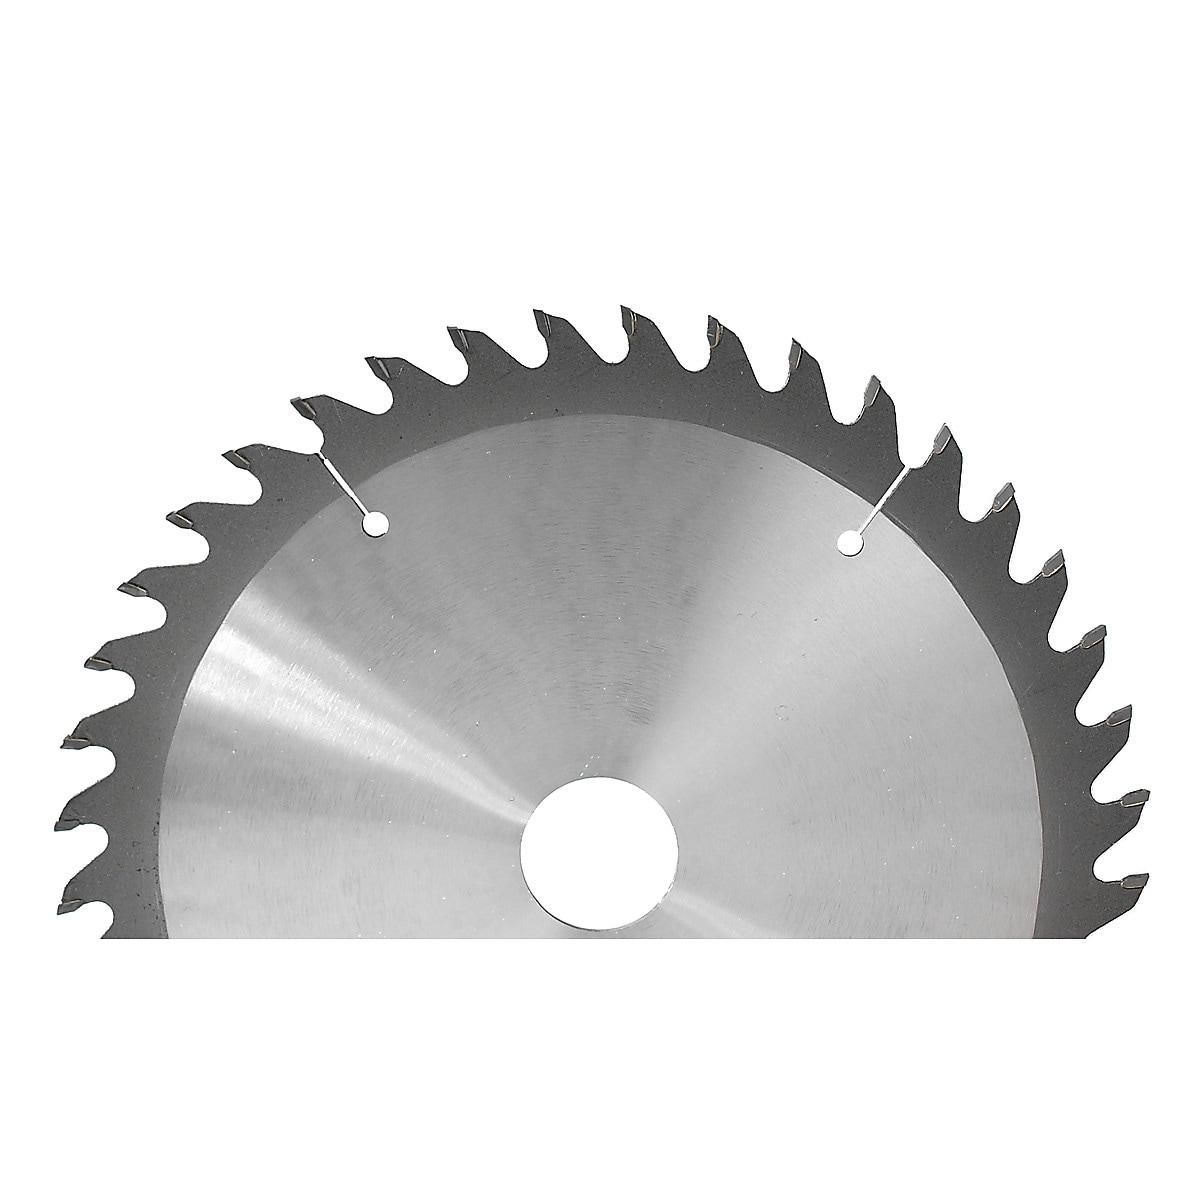 Sågklinga 210 x 30, 25, 16 mm 40T, Cocraft